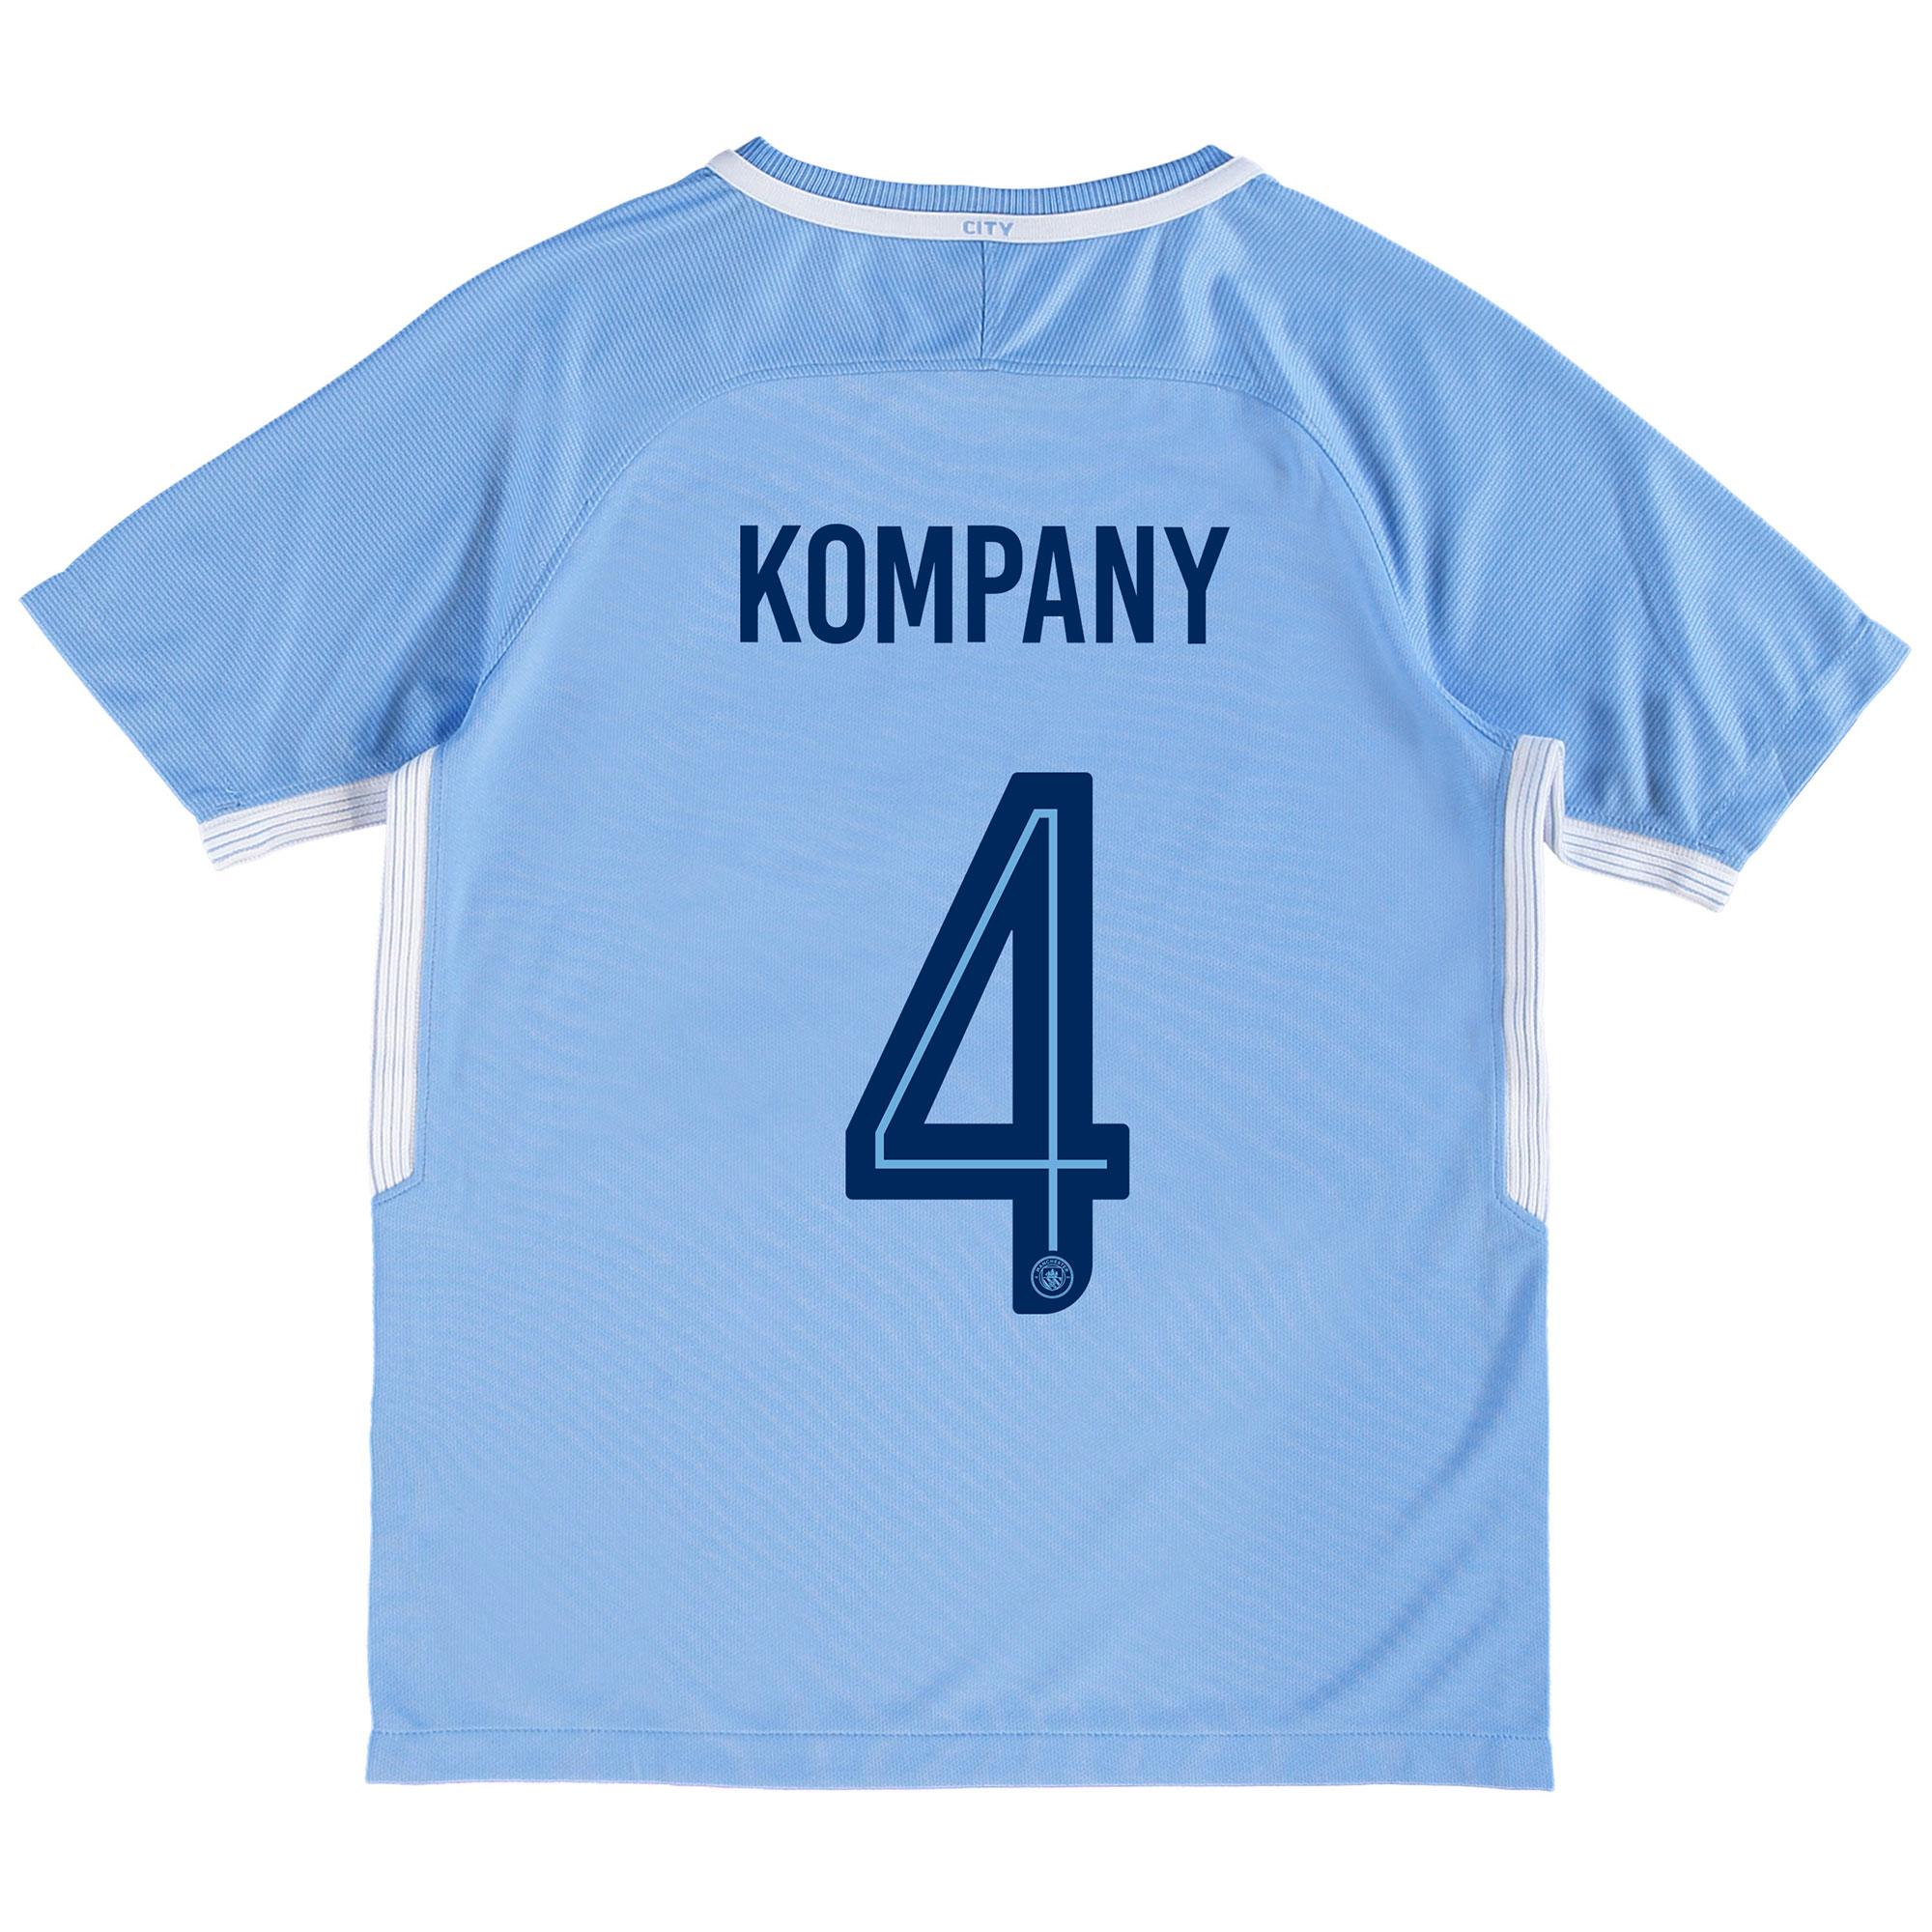 Manchester City Home Stadium Cup Shirt 2017-18 - Kids with Kompany 4 p